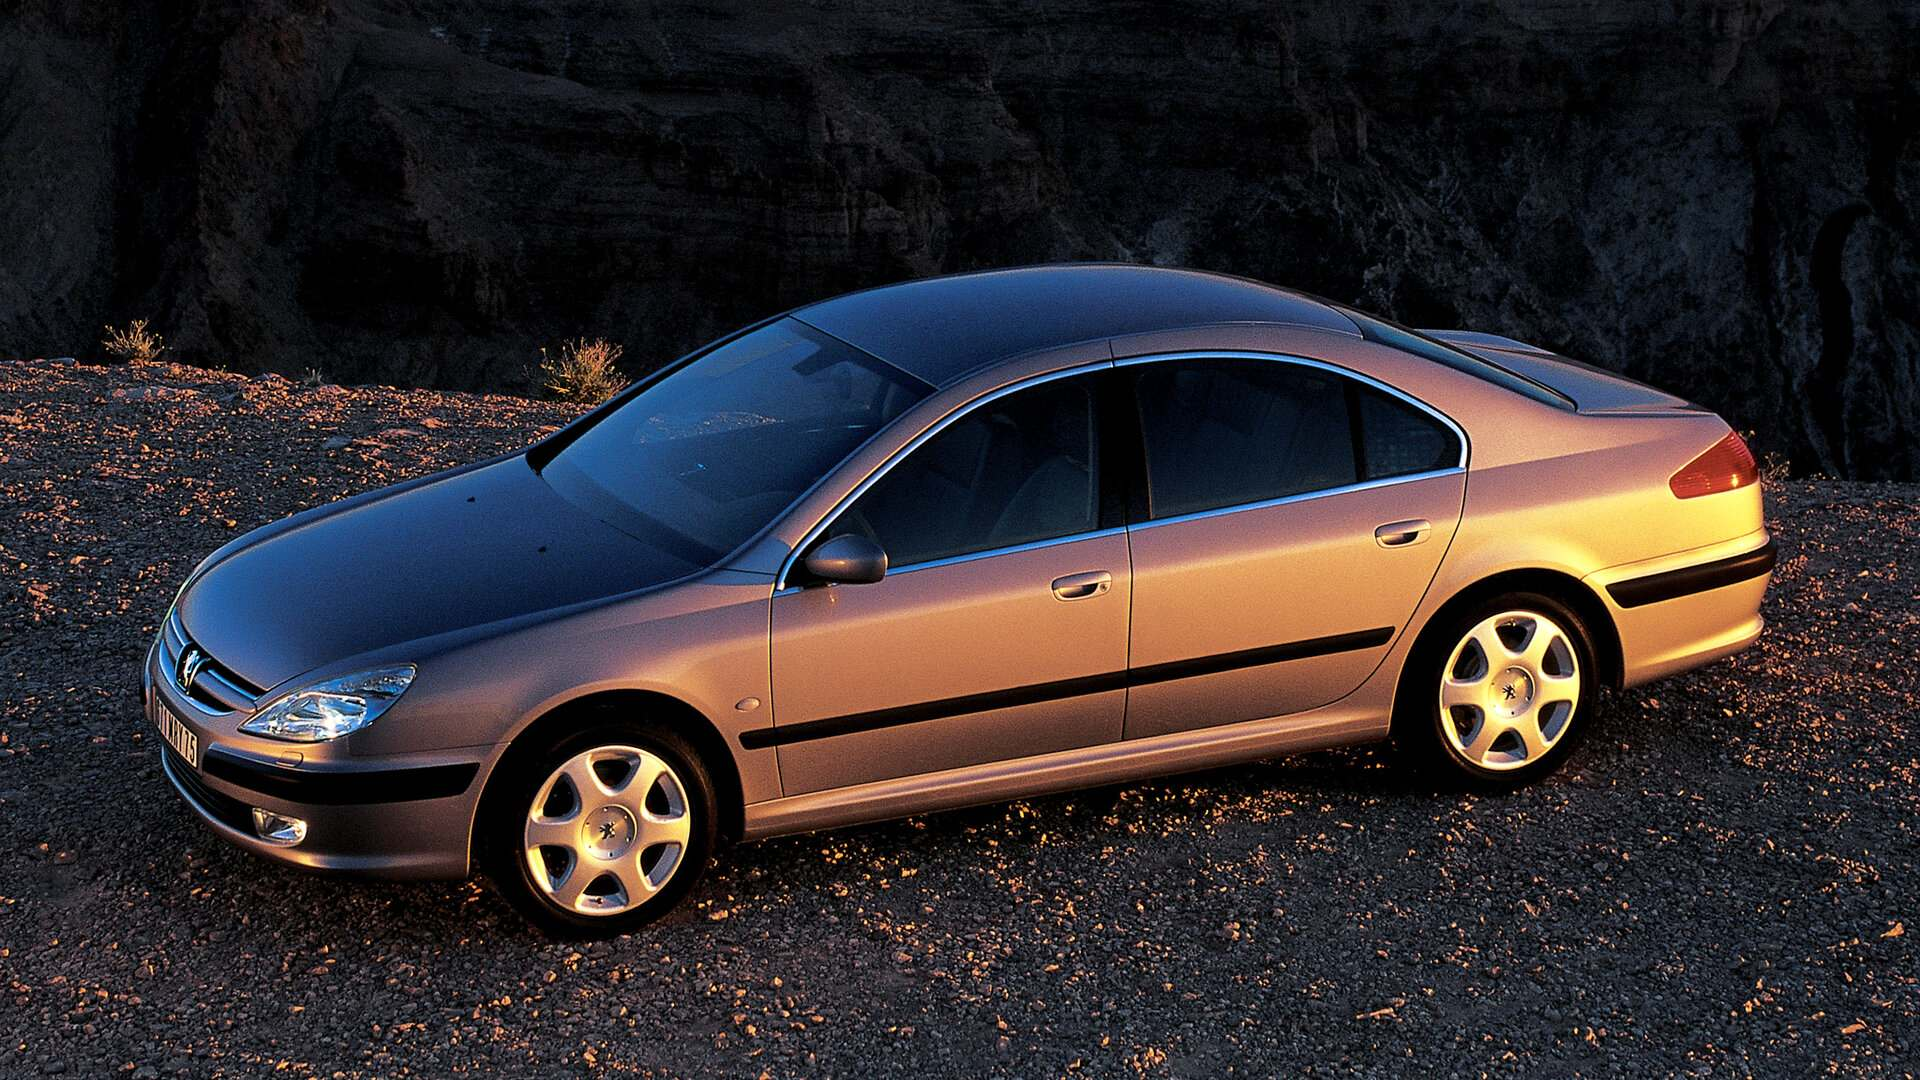 Coche del día: Peugeot 607